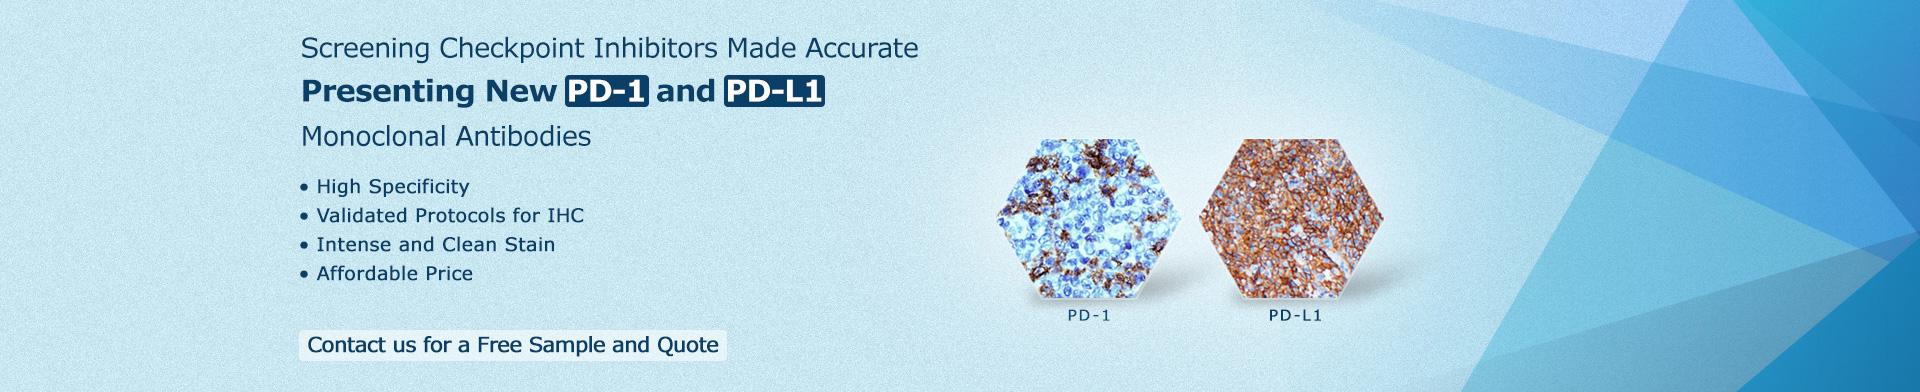 PD-1 and PD-L1 monoclonal antibodies for immunohistochemistry (IHC) biomarker screening